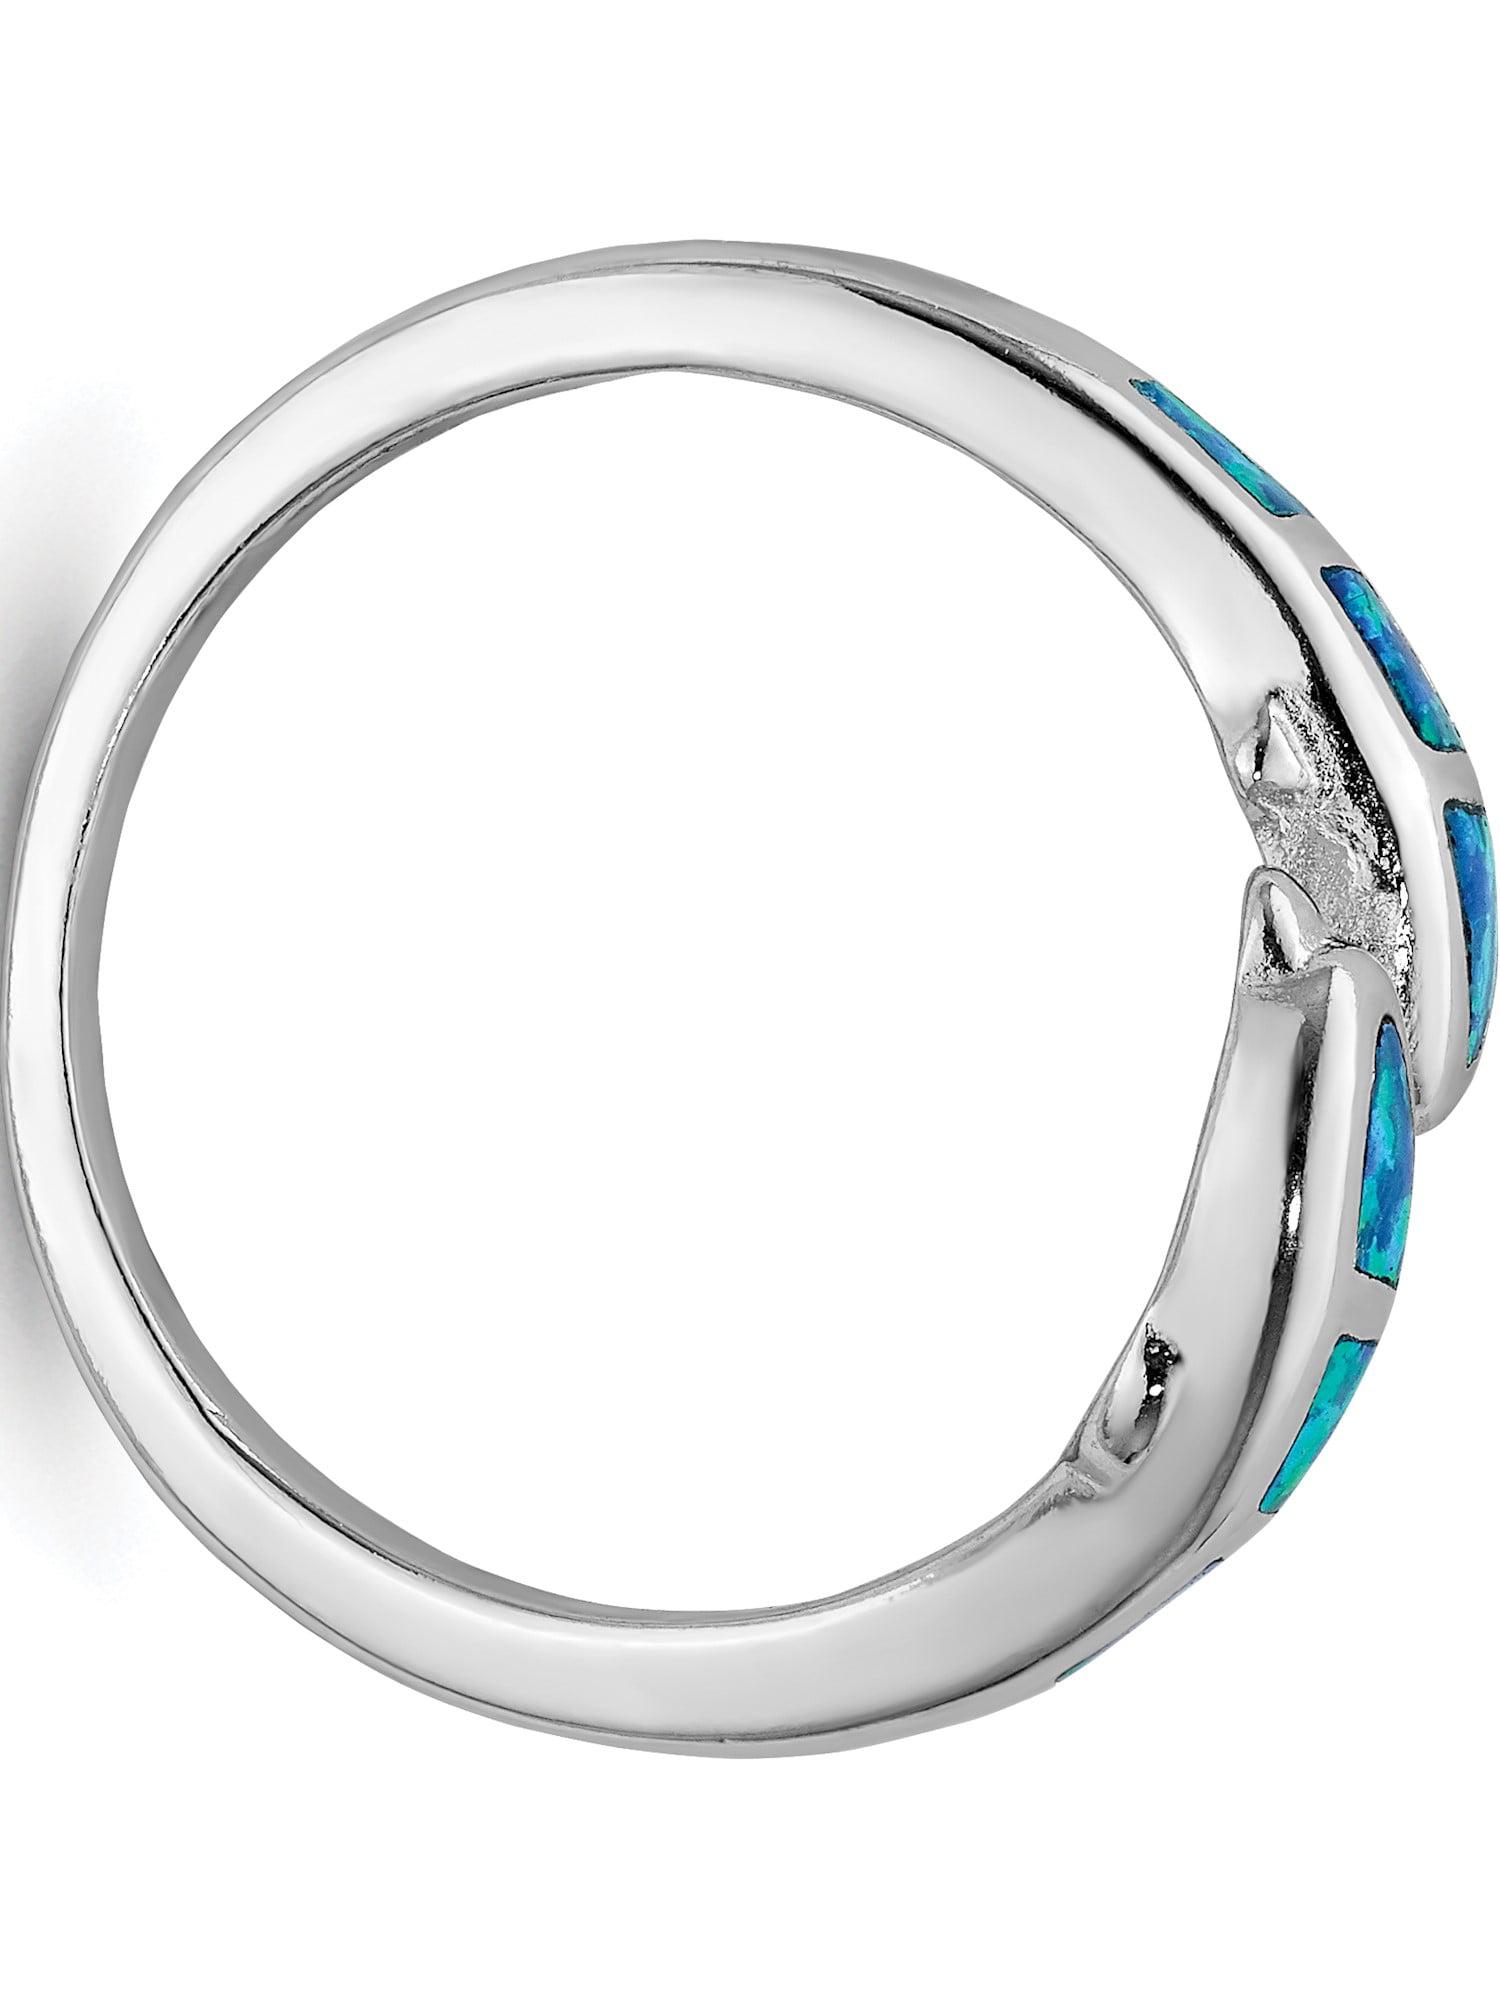 Fashion Jewelry ~ Black and Silvertone Round Loop Scarf Charm Pendant Scarf Charm 020c 47